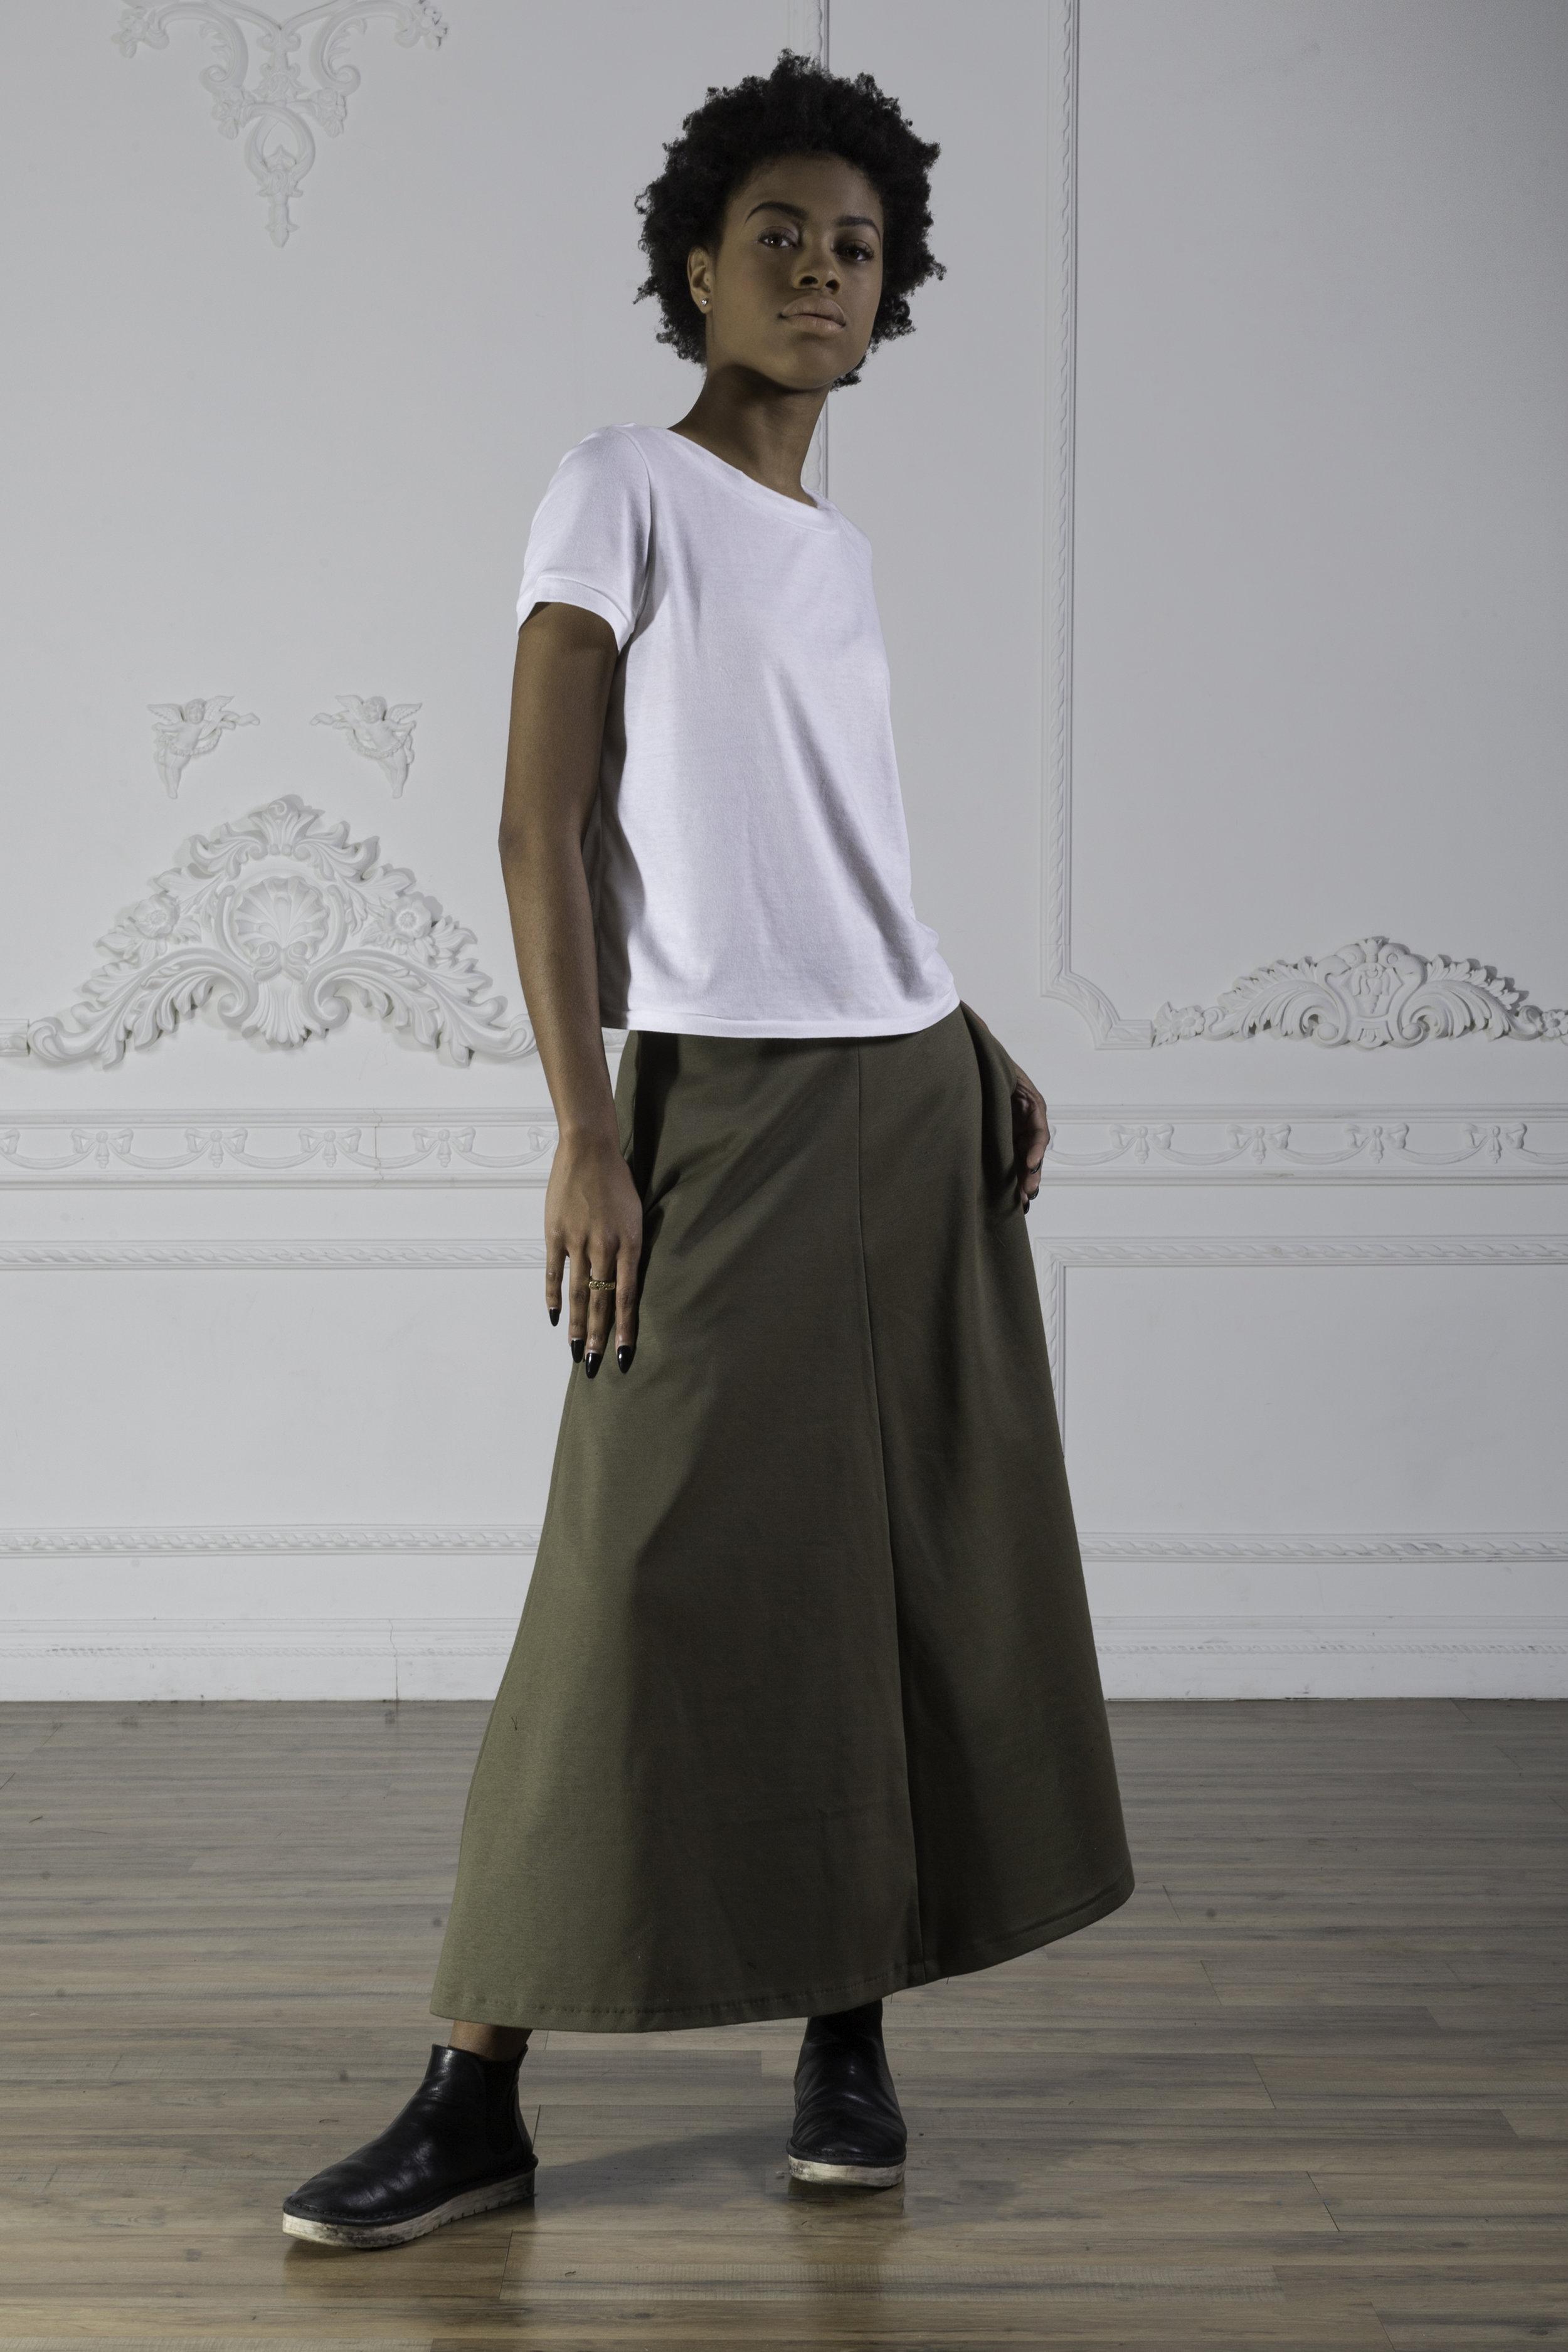 A Skirt + Loose Tee 2.jpg